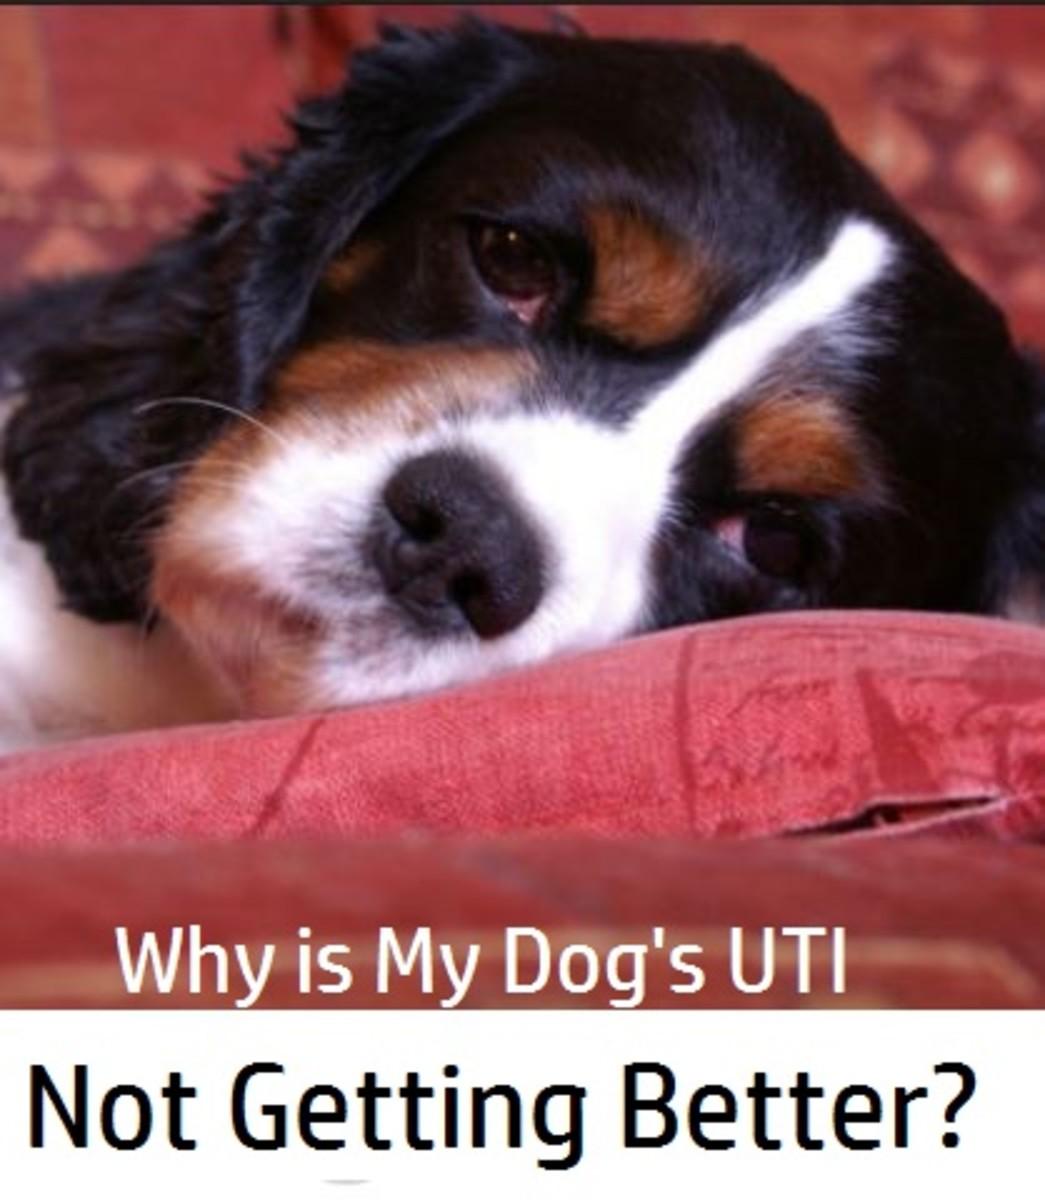 dog uti not getting better